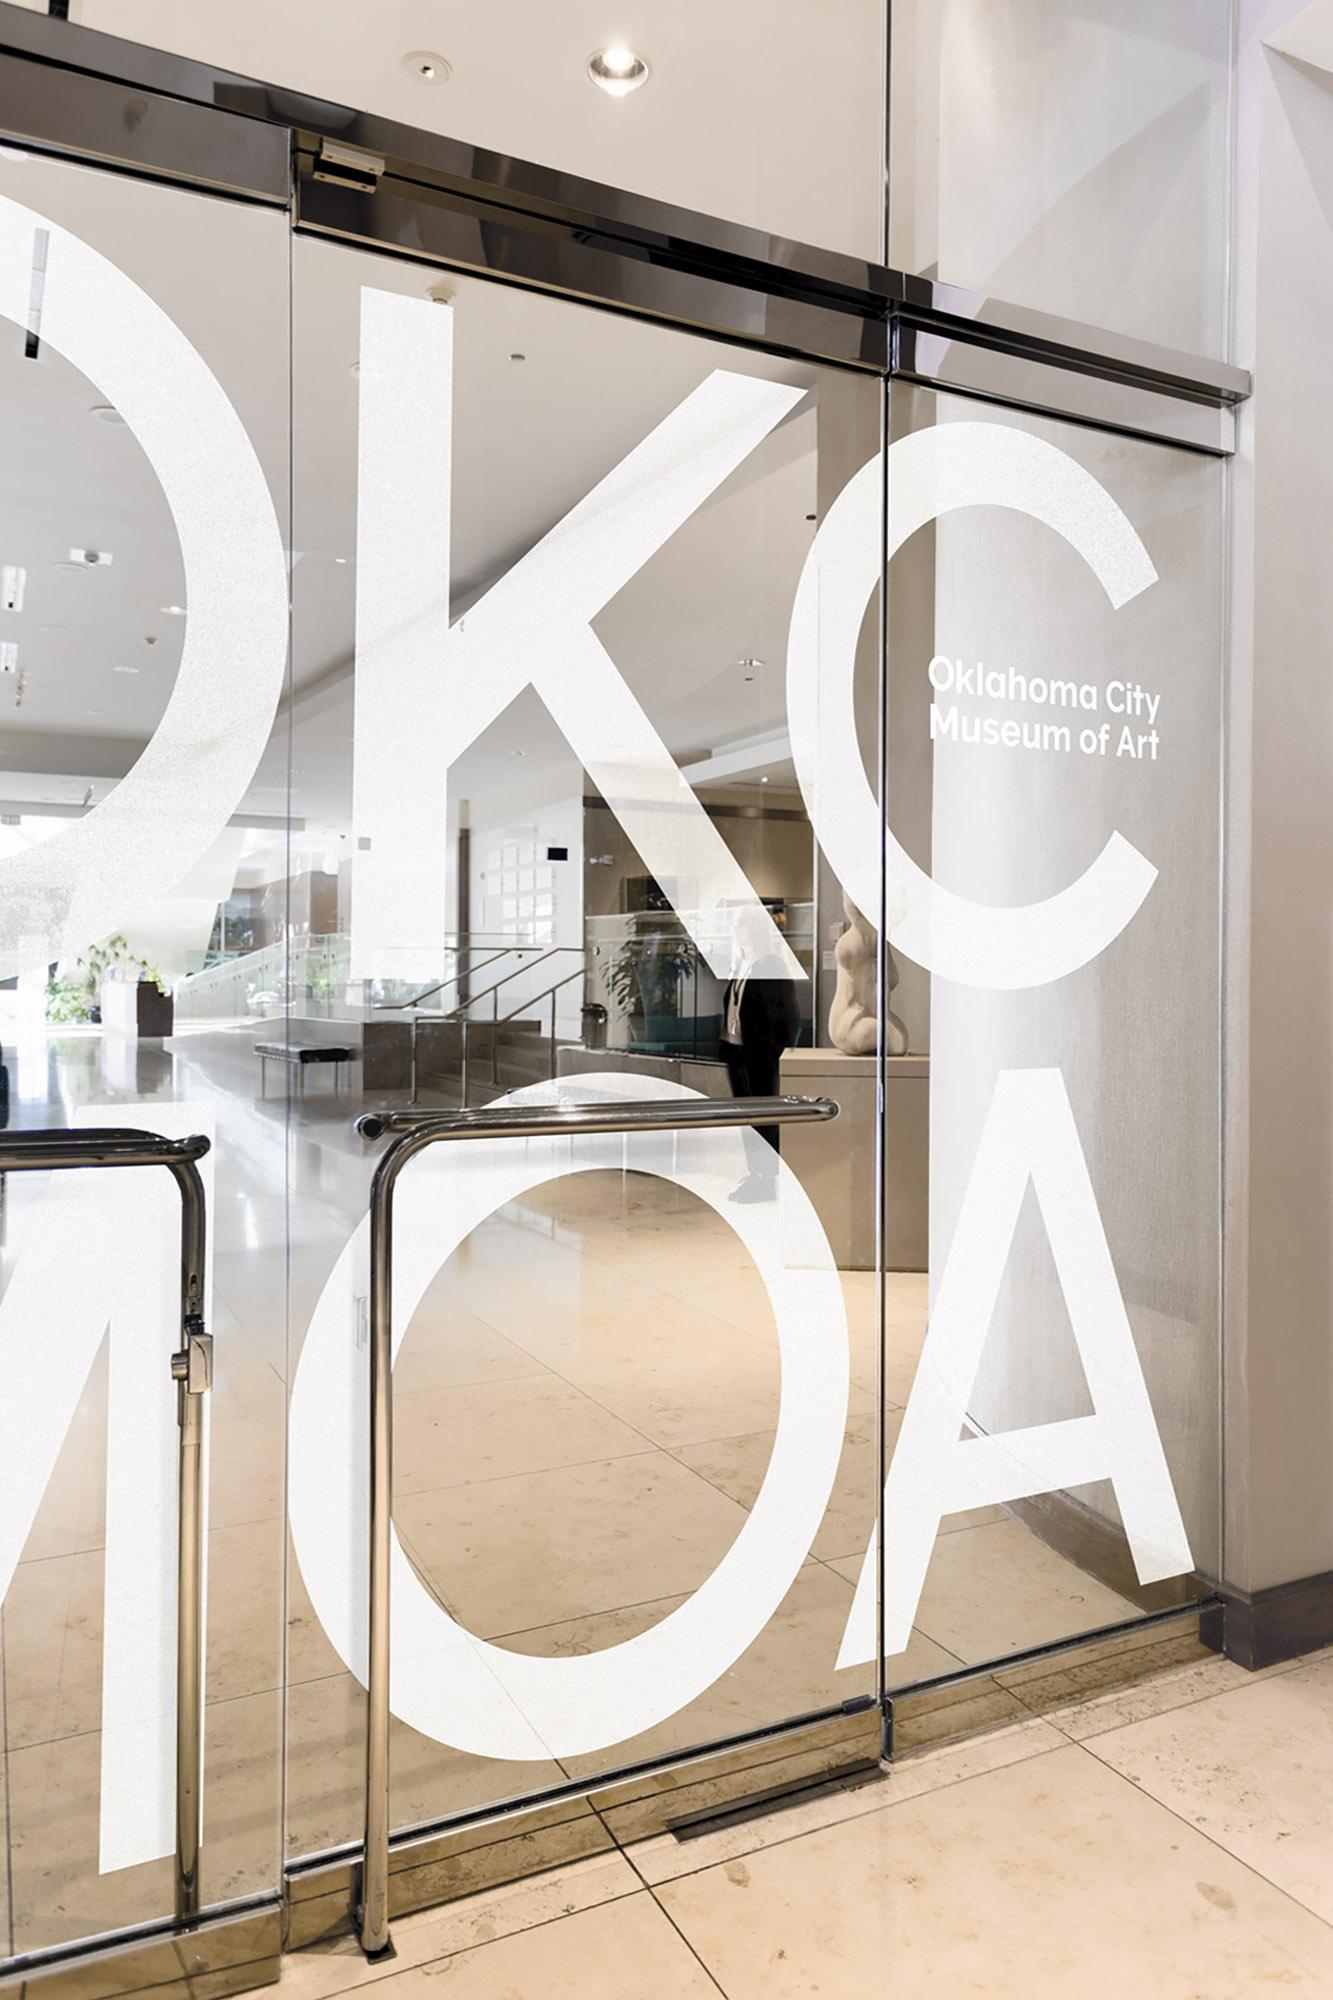 OKCMOA Glassdoors